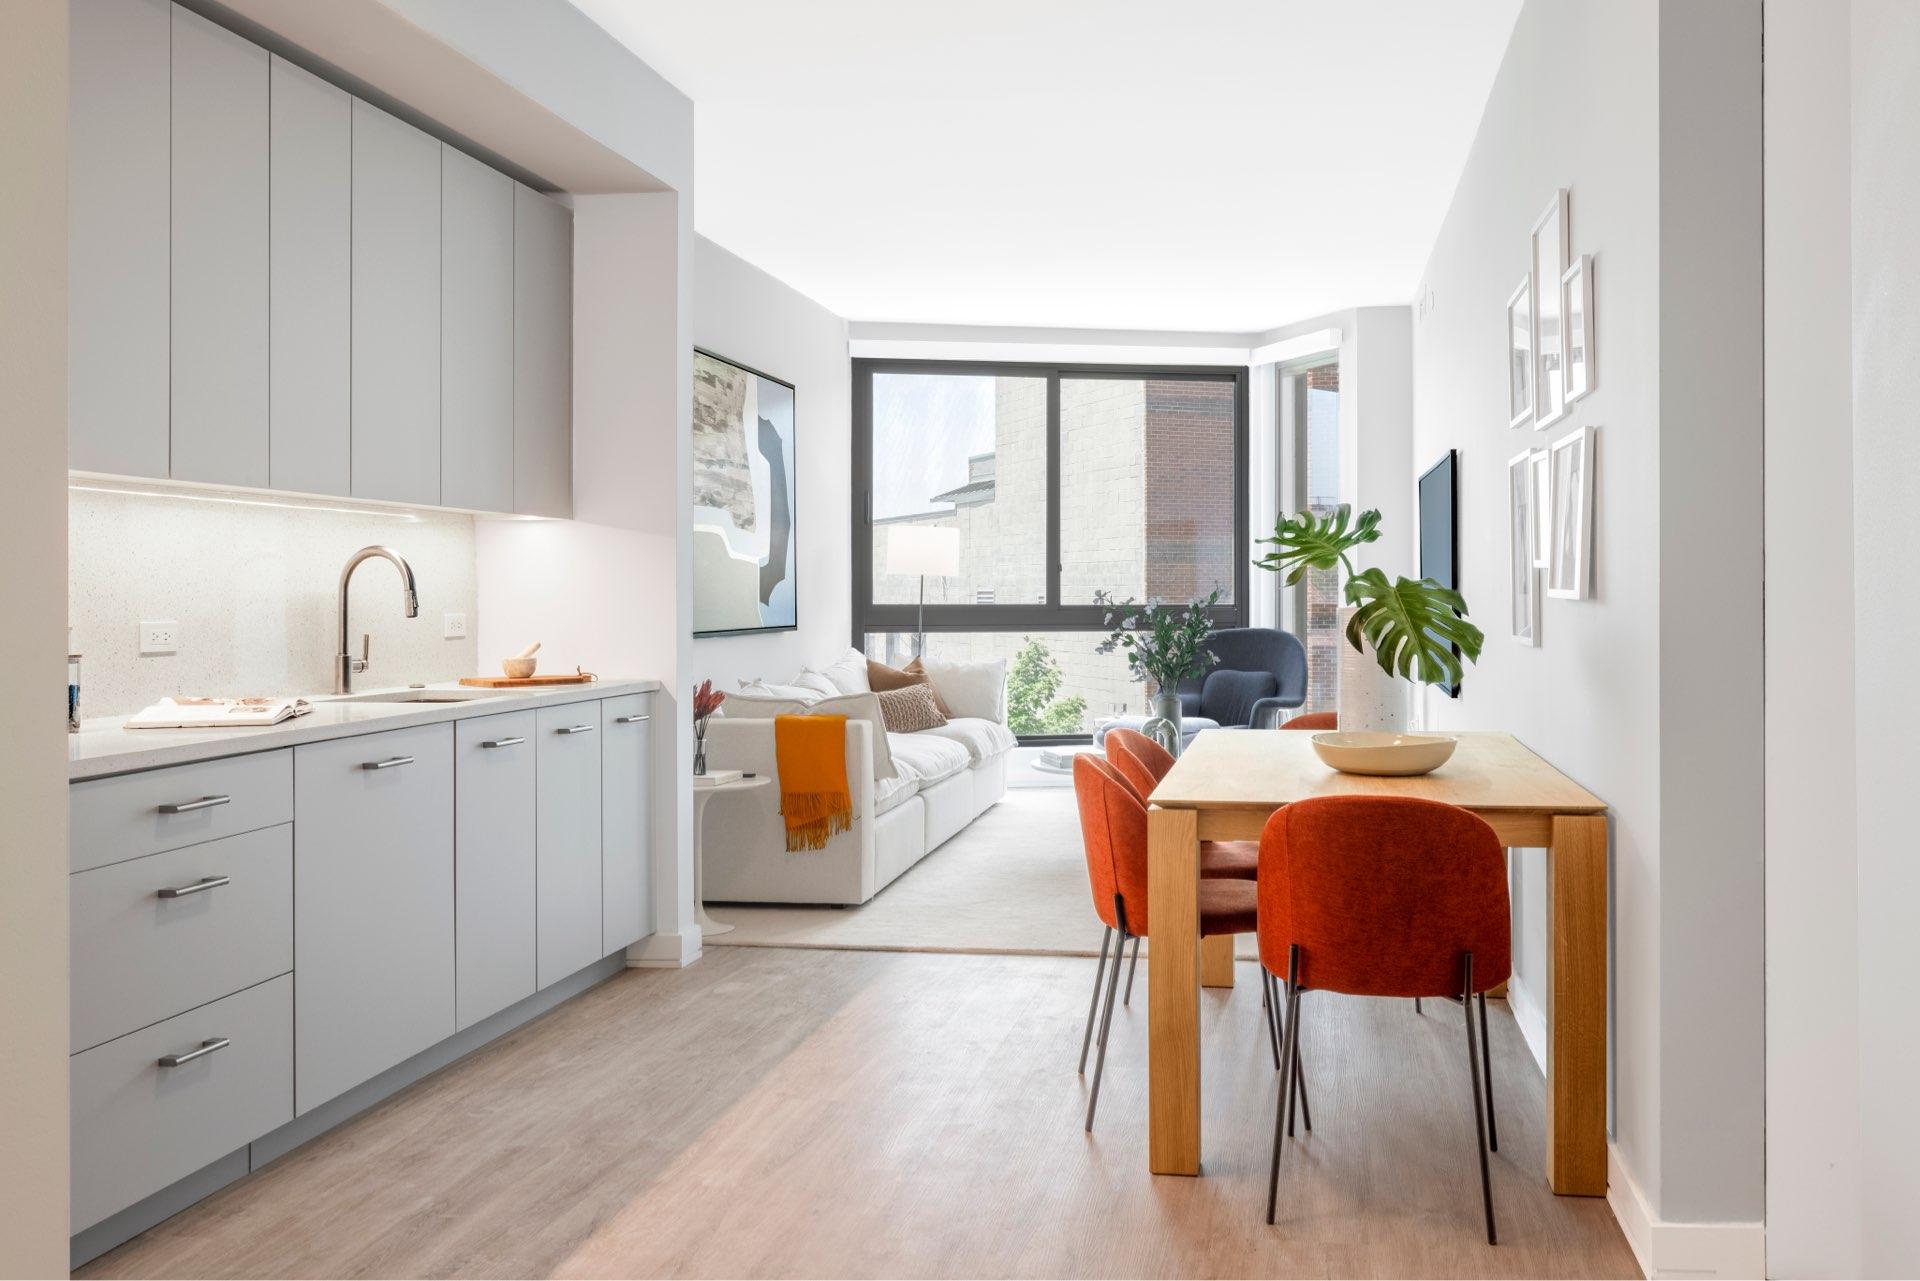 Bright, airy Adams Morgan apartment homes